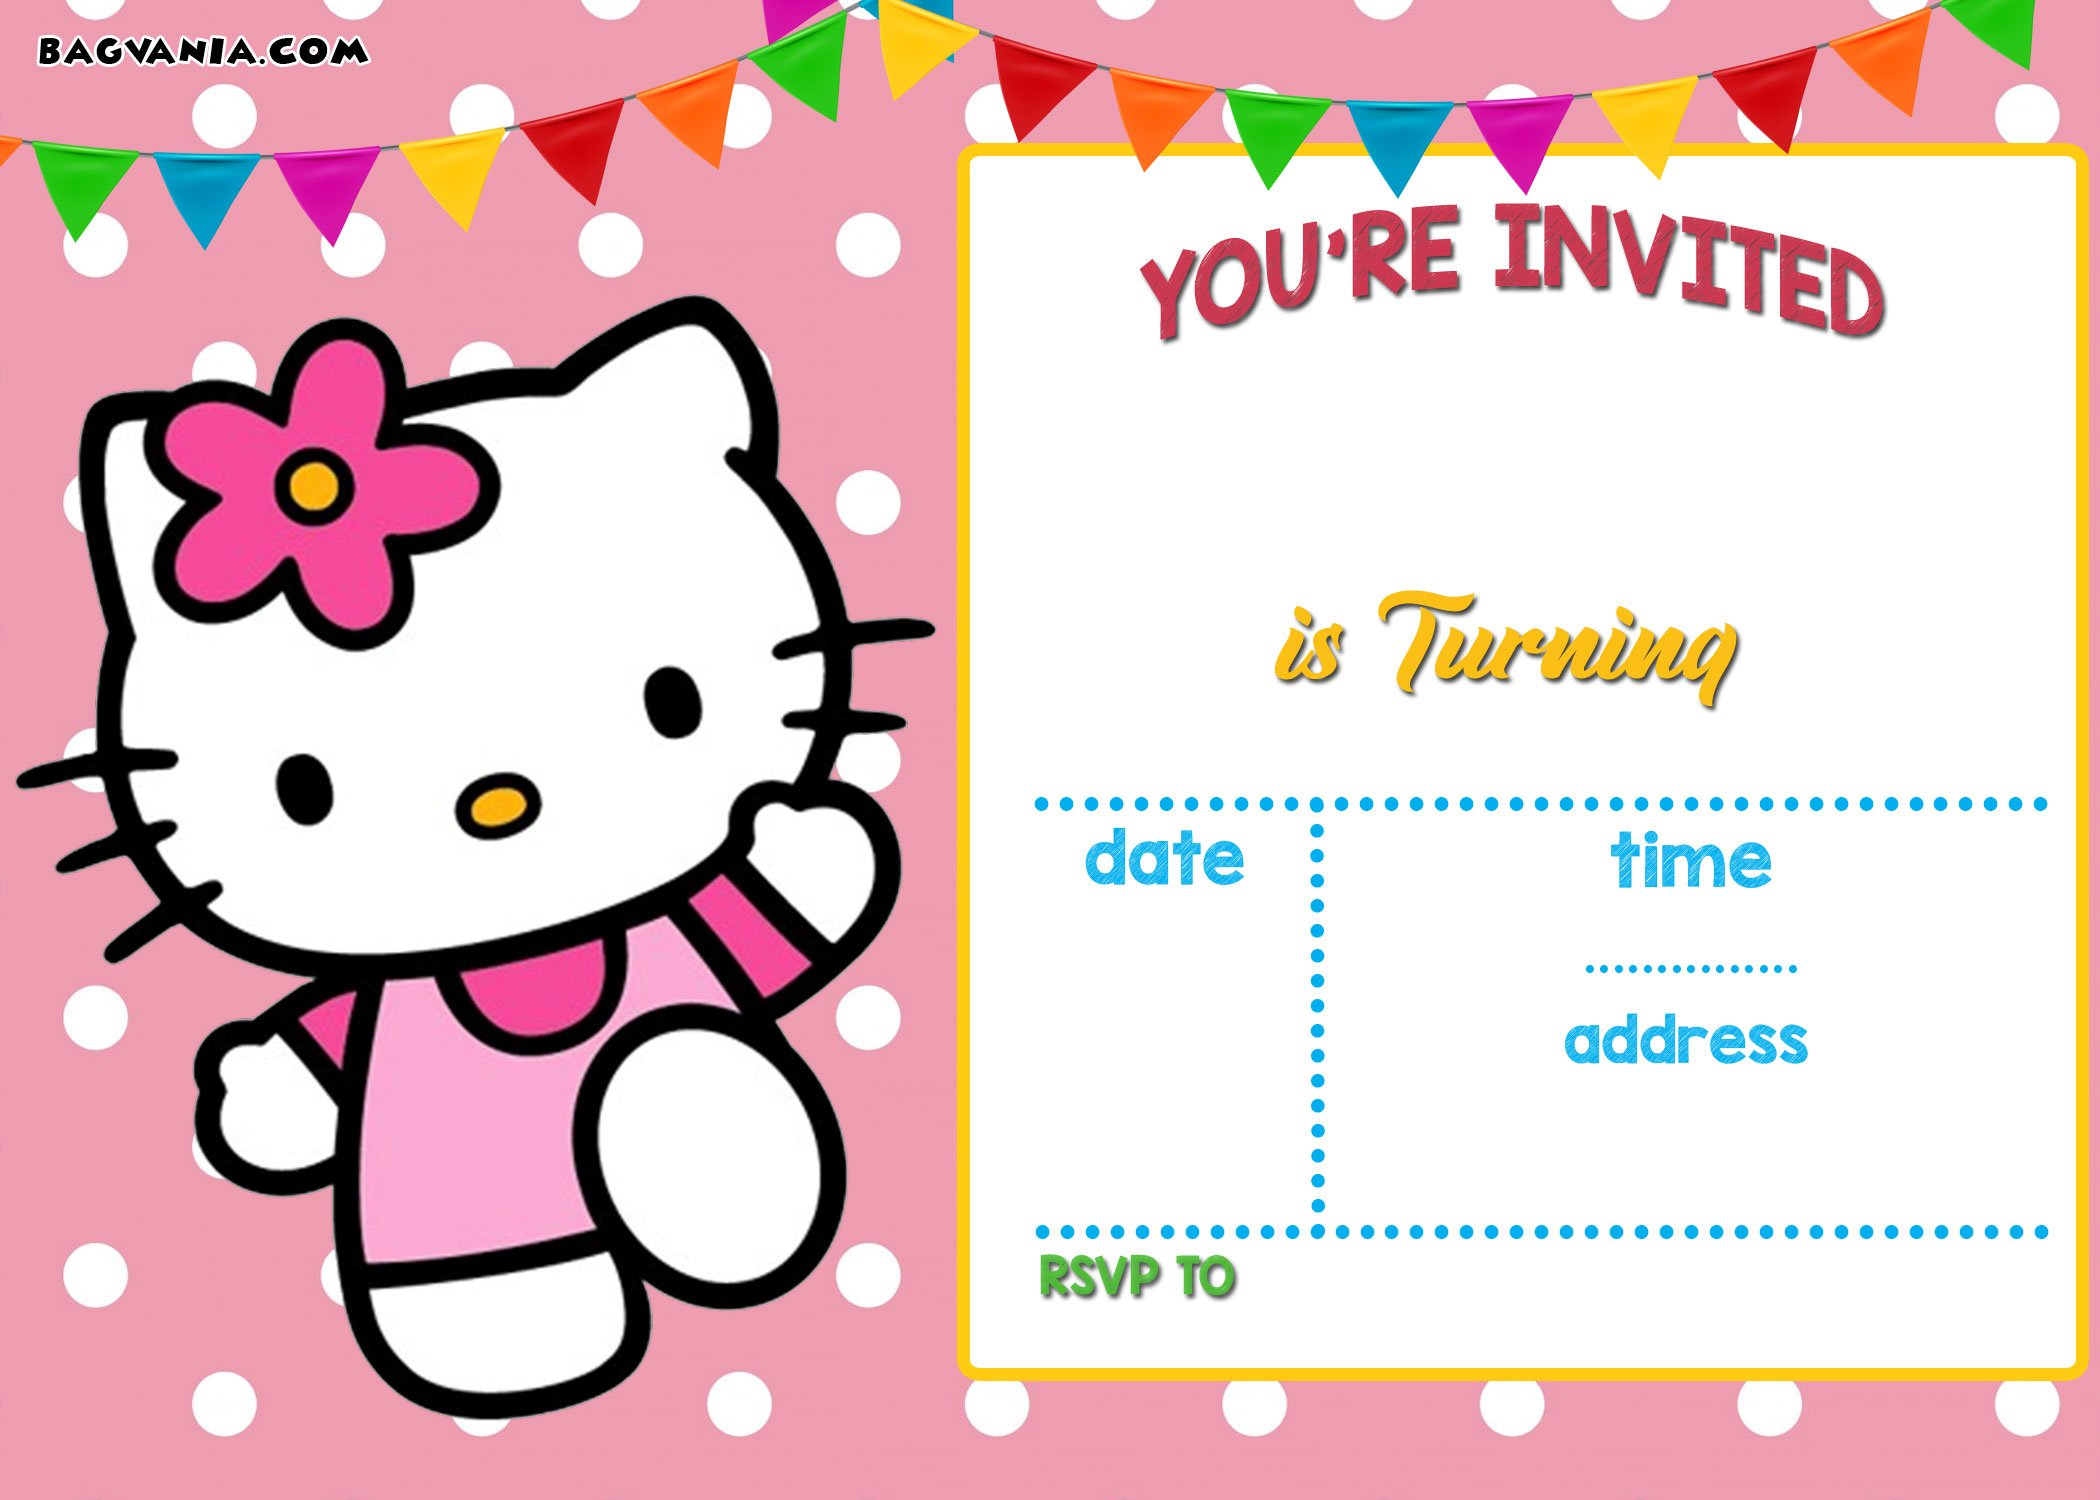 Personalised Invitations Online